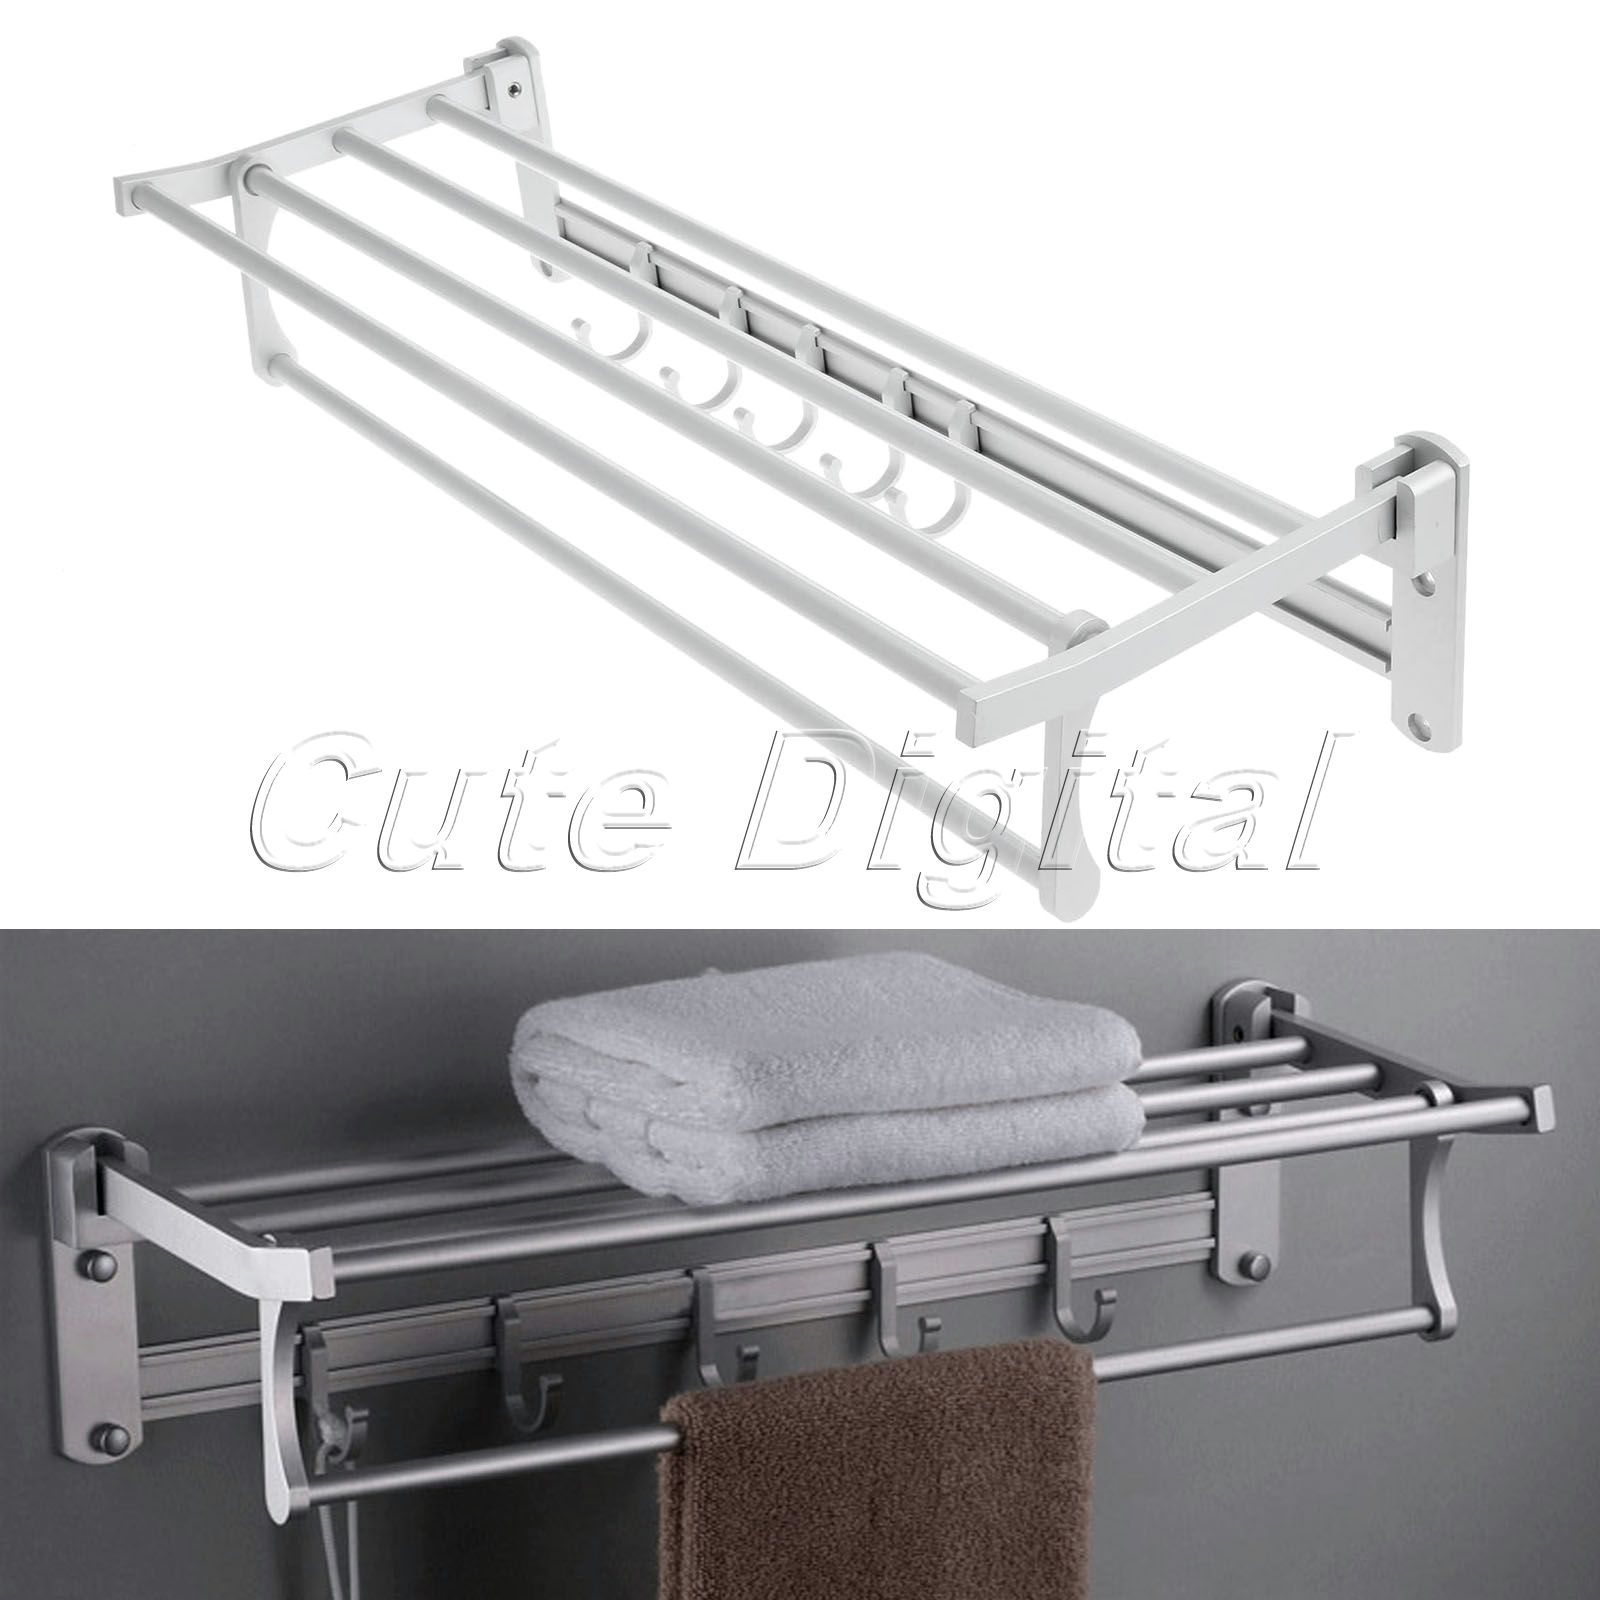 rack and com towel whitmor walmart shelf chrome ip